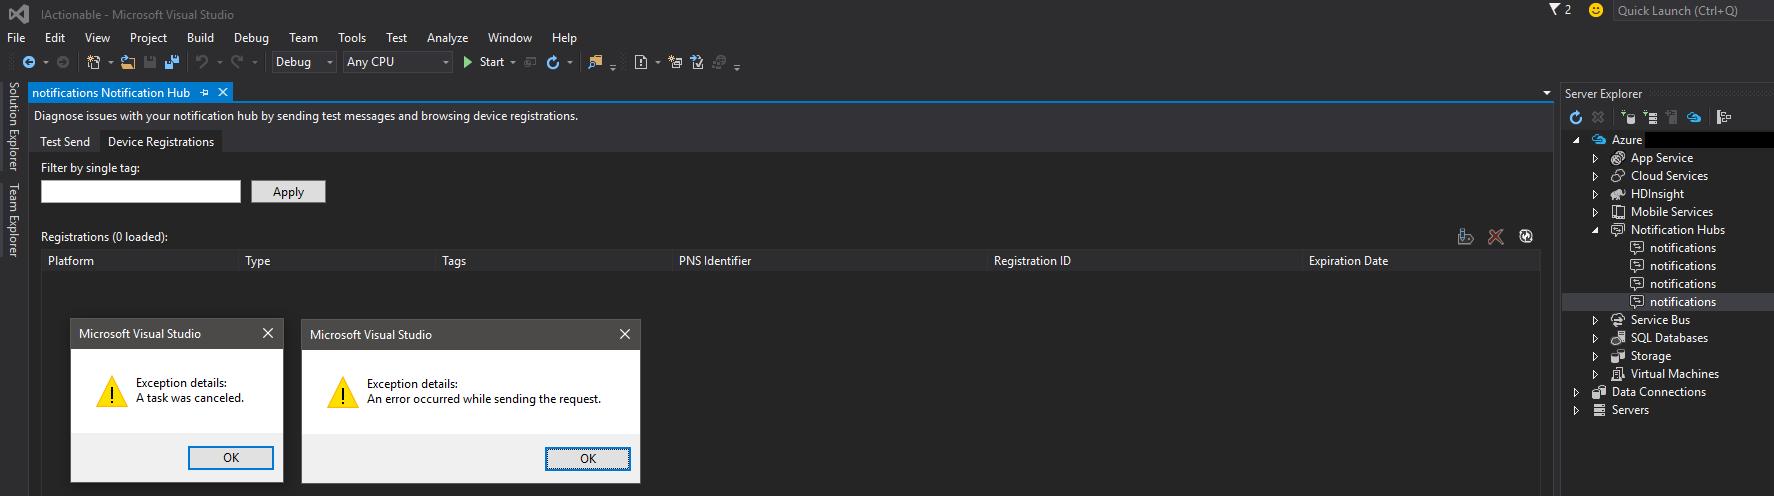 Visual Studio Hub Notifications Errors